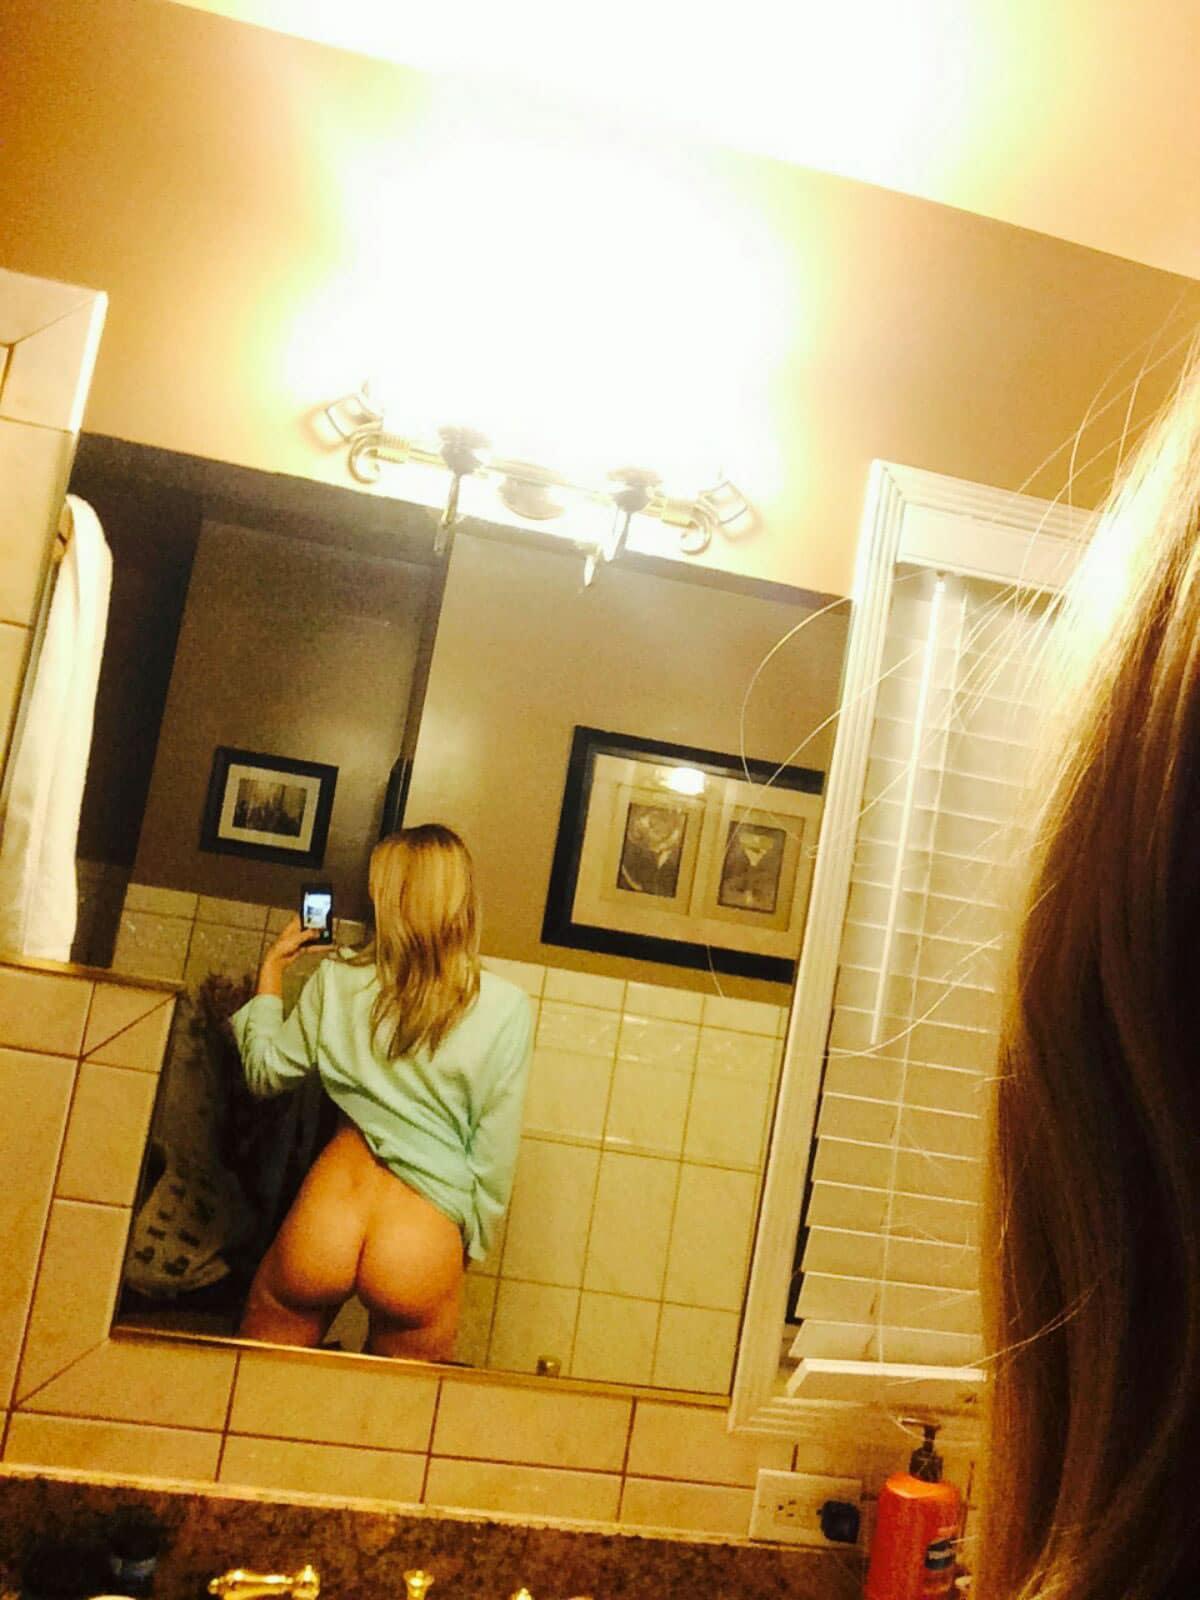 AJ Michalka exposing her ass in the bathroom